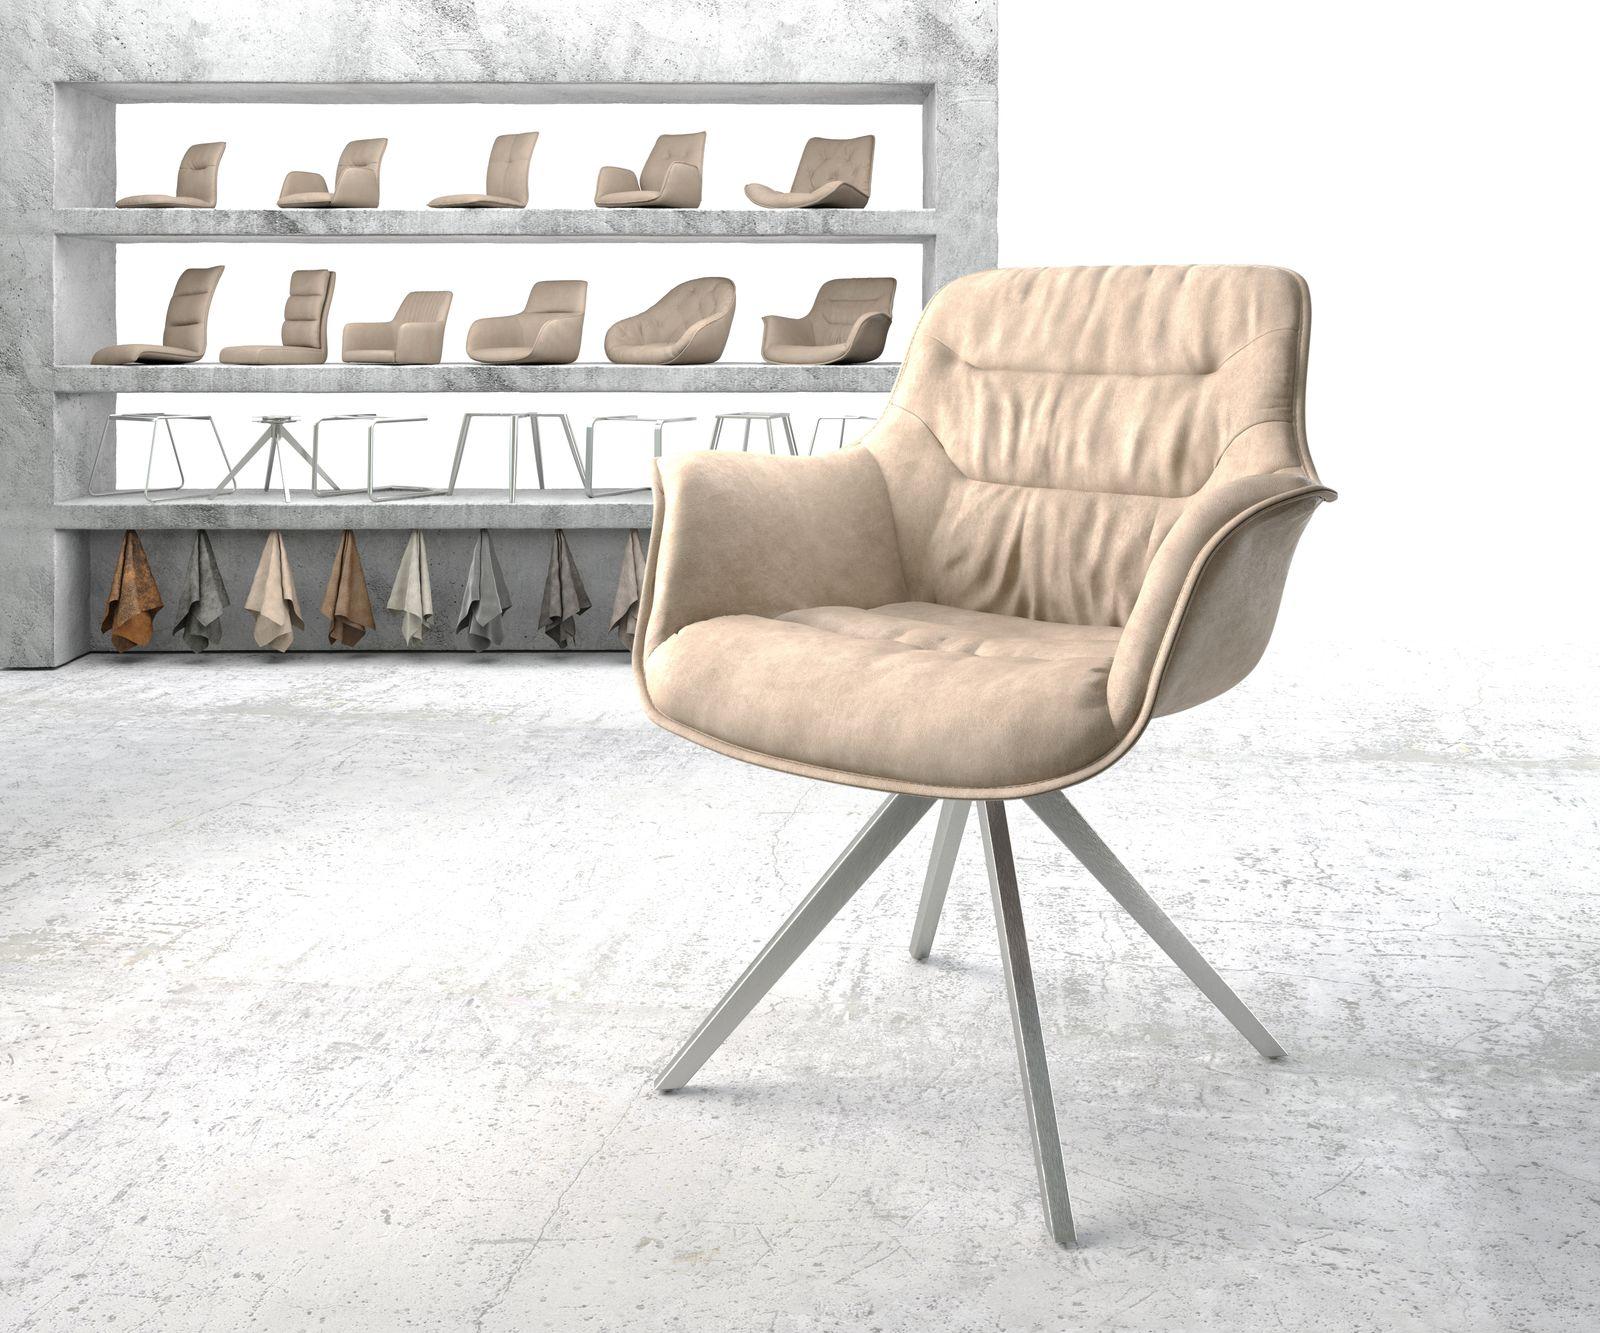 delife-armlehnstuhl-kaira-flex-beige-vintage-kreuzgestell-drehbar-edelstahl-esszimmerstuhle